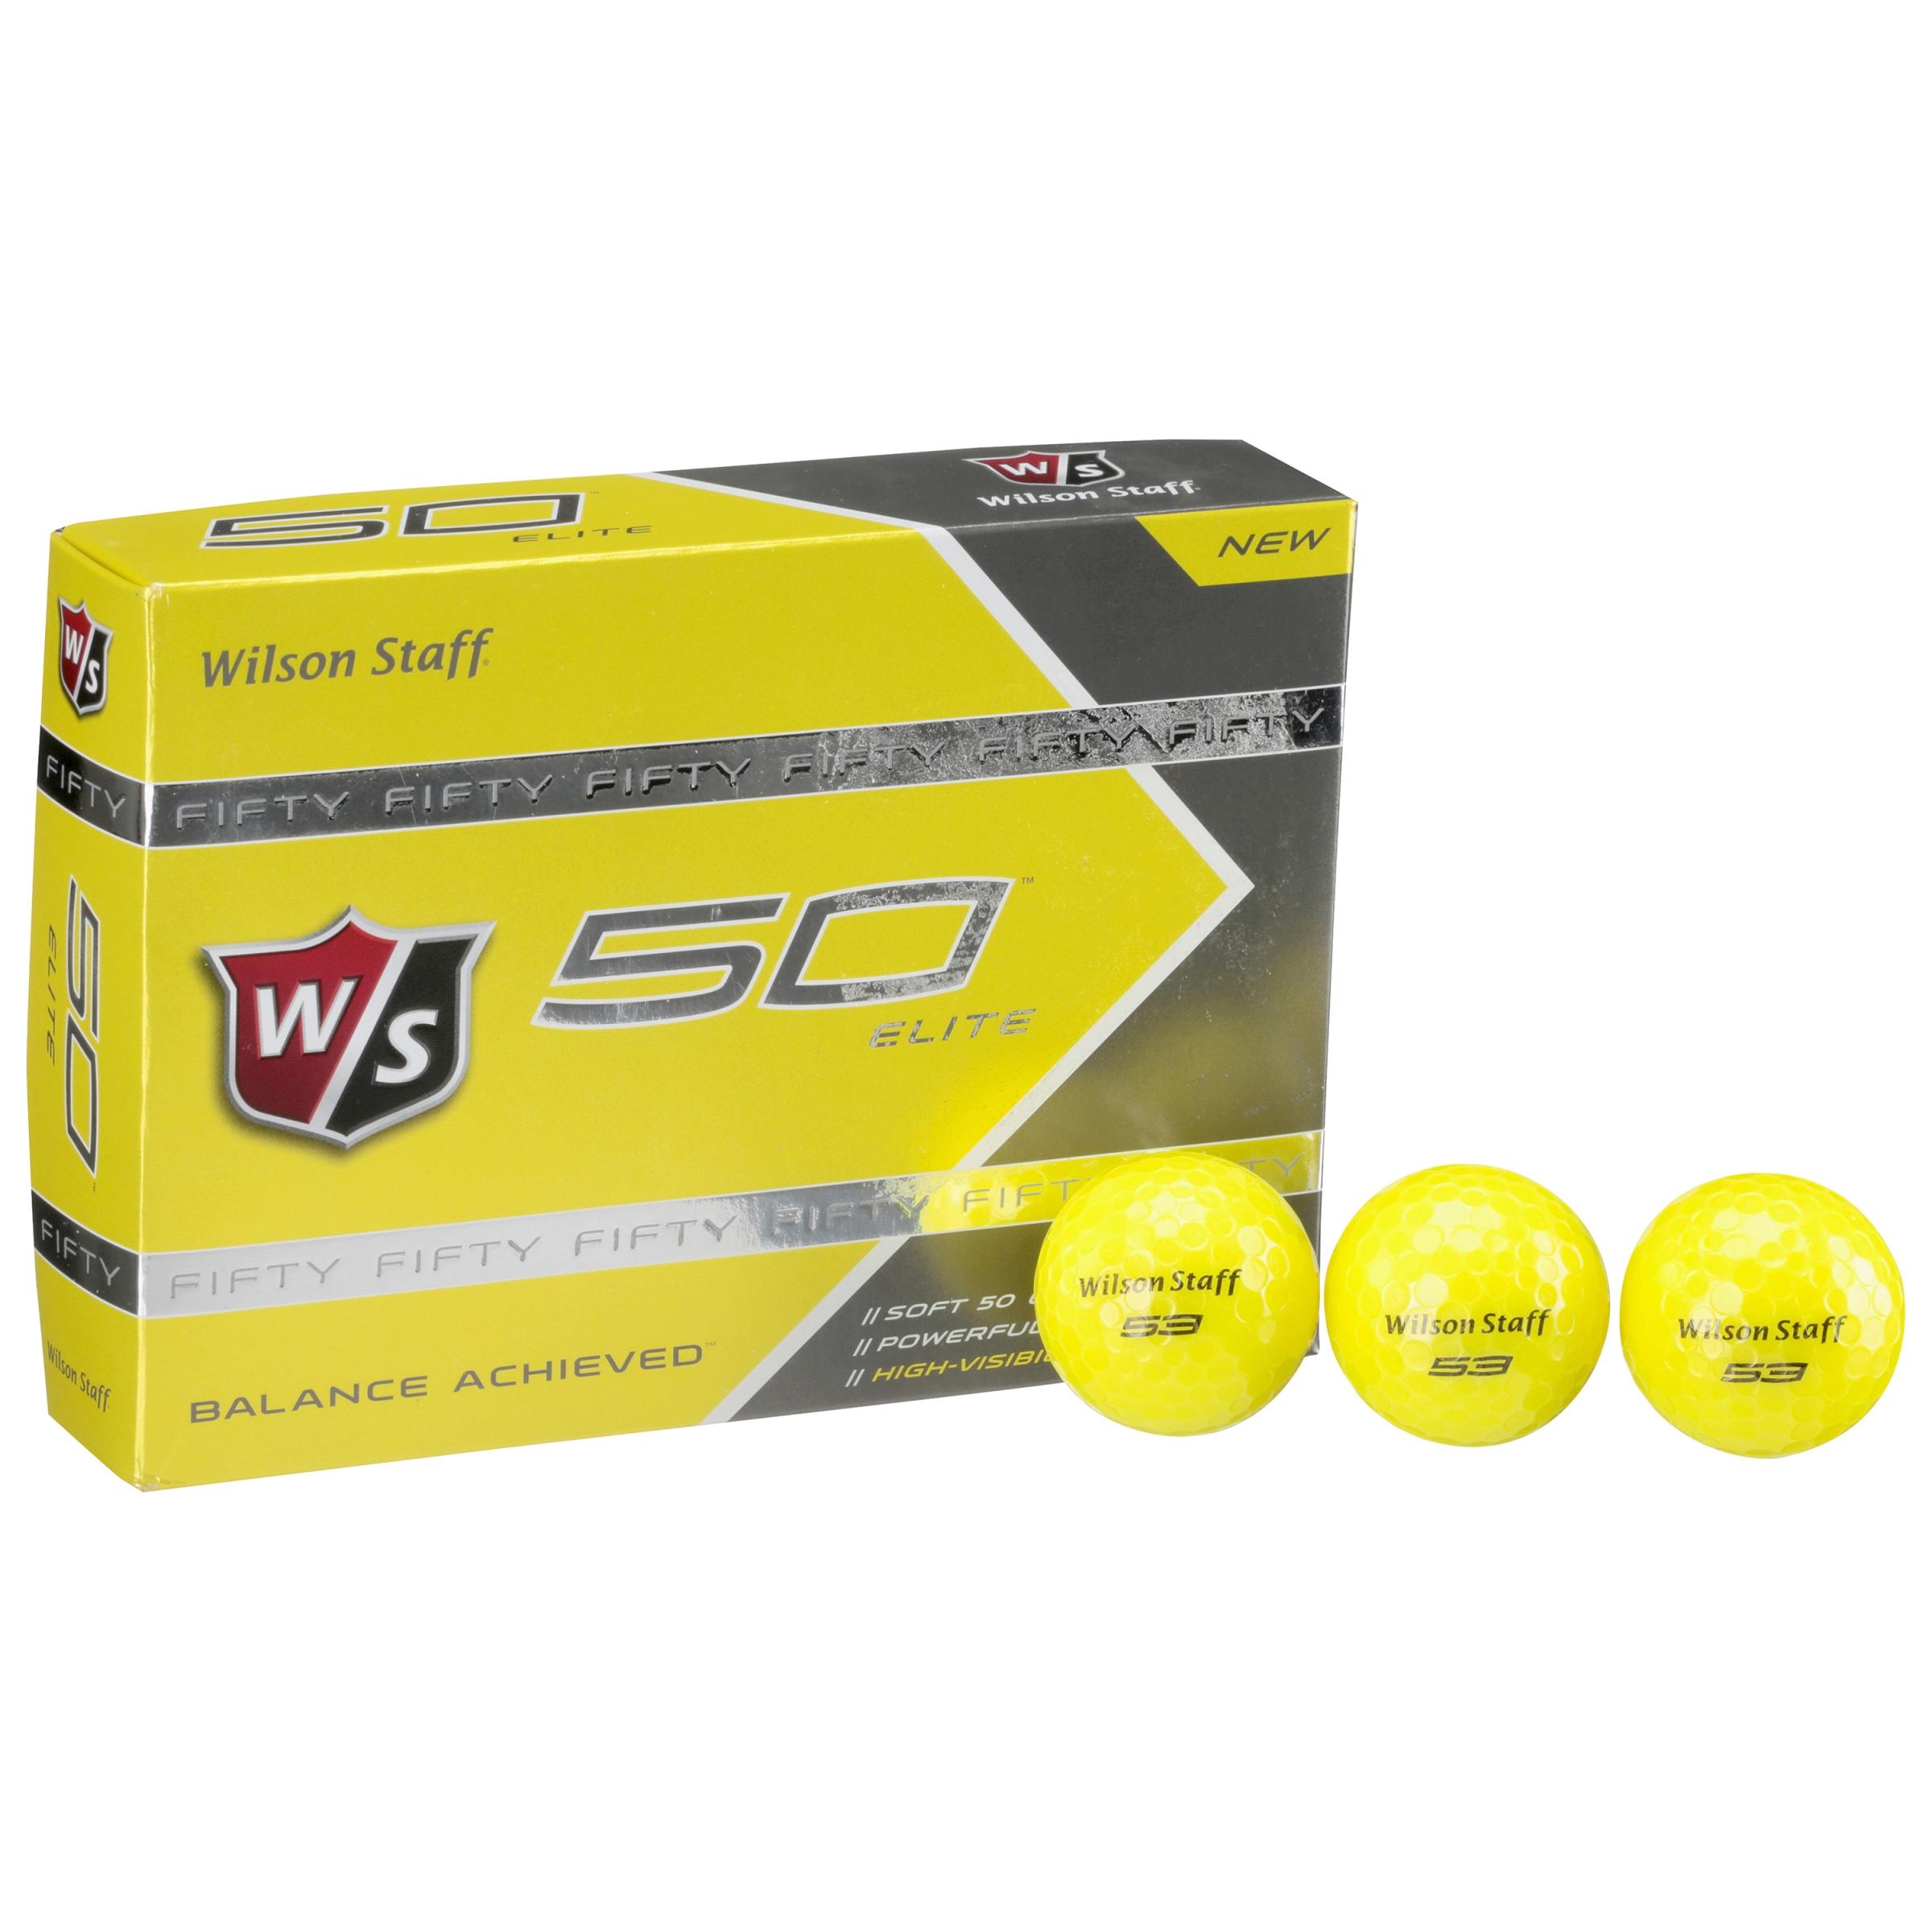 Wilson Staff 50 Elite Golf Balls, Yellow, 12 Pack